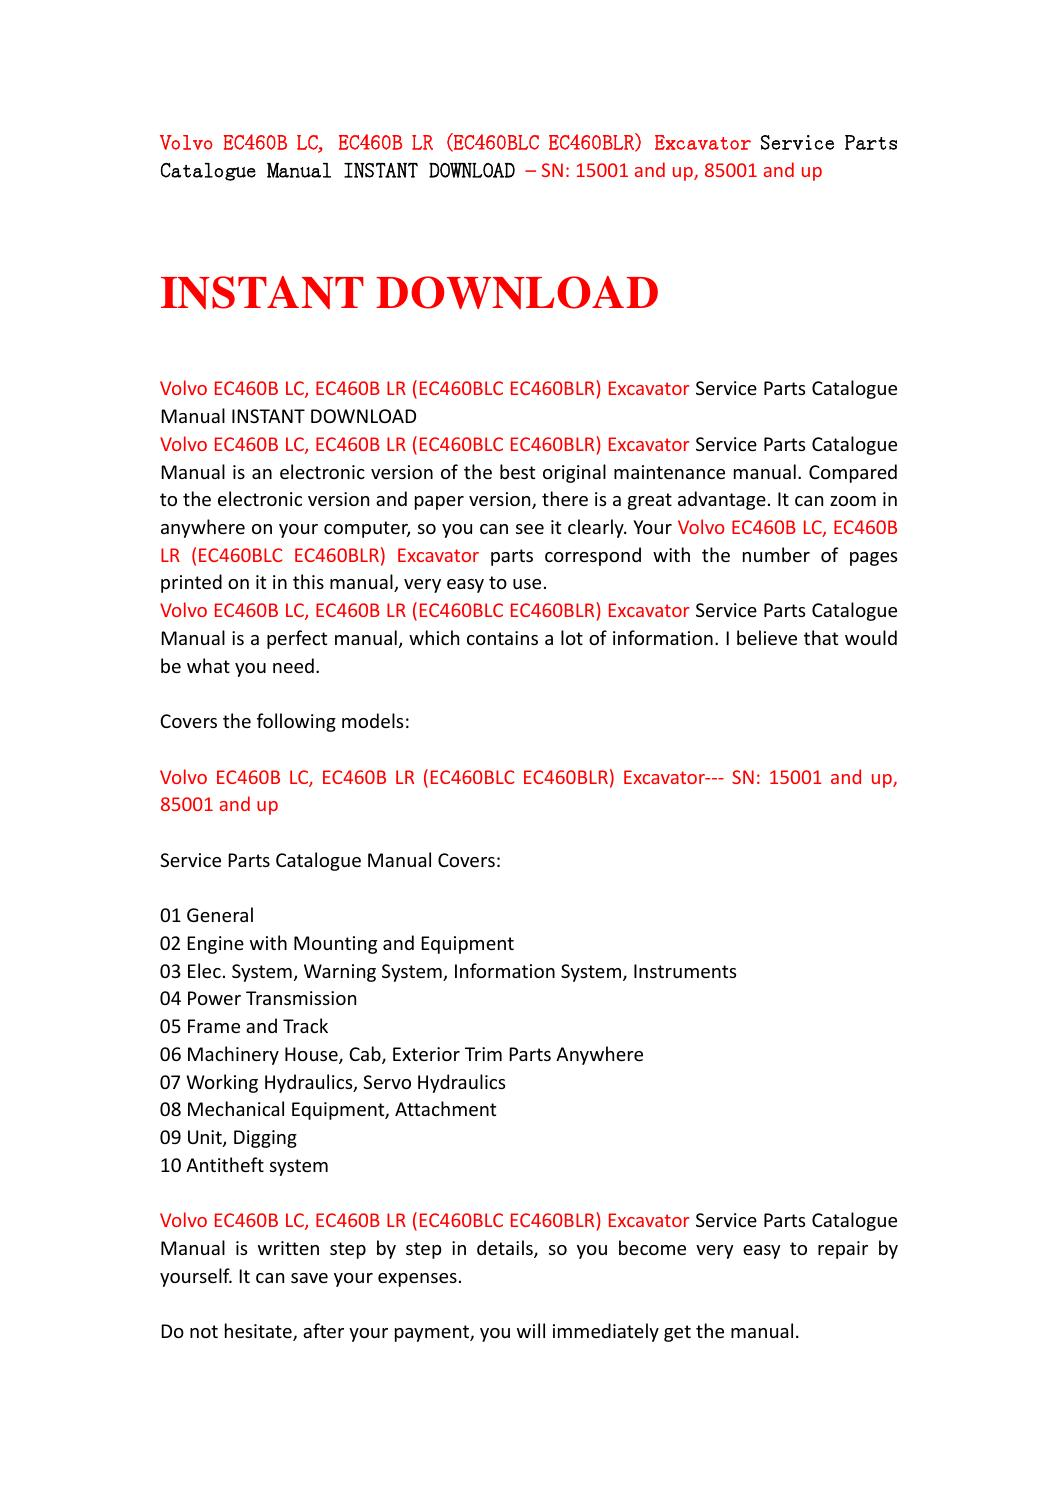 Volvo ec460b lc, ec460b lr (ec460blc ec460blr) excavator service parts  catalogue manual instant down by yhsegfbh - issuu